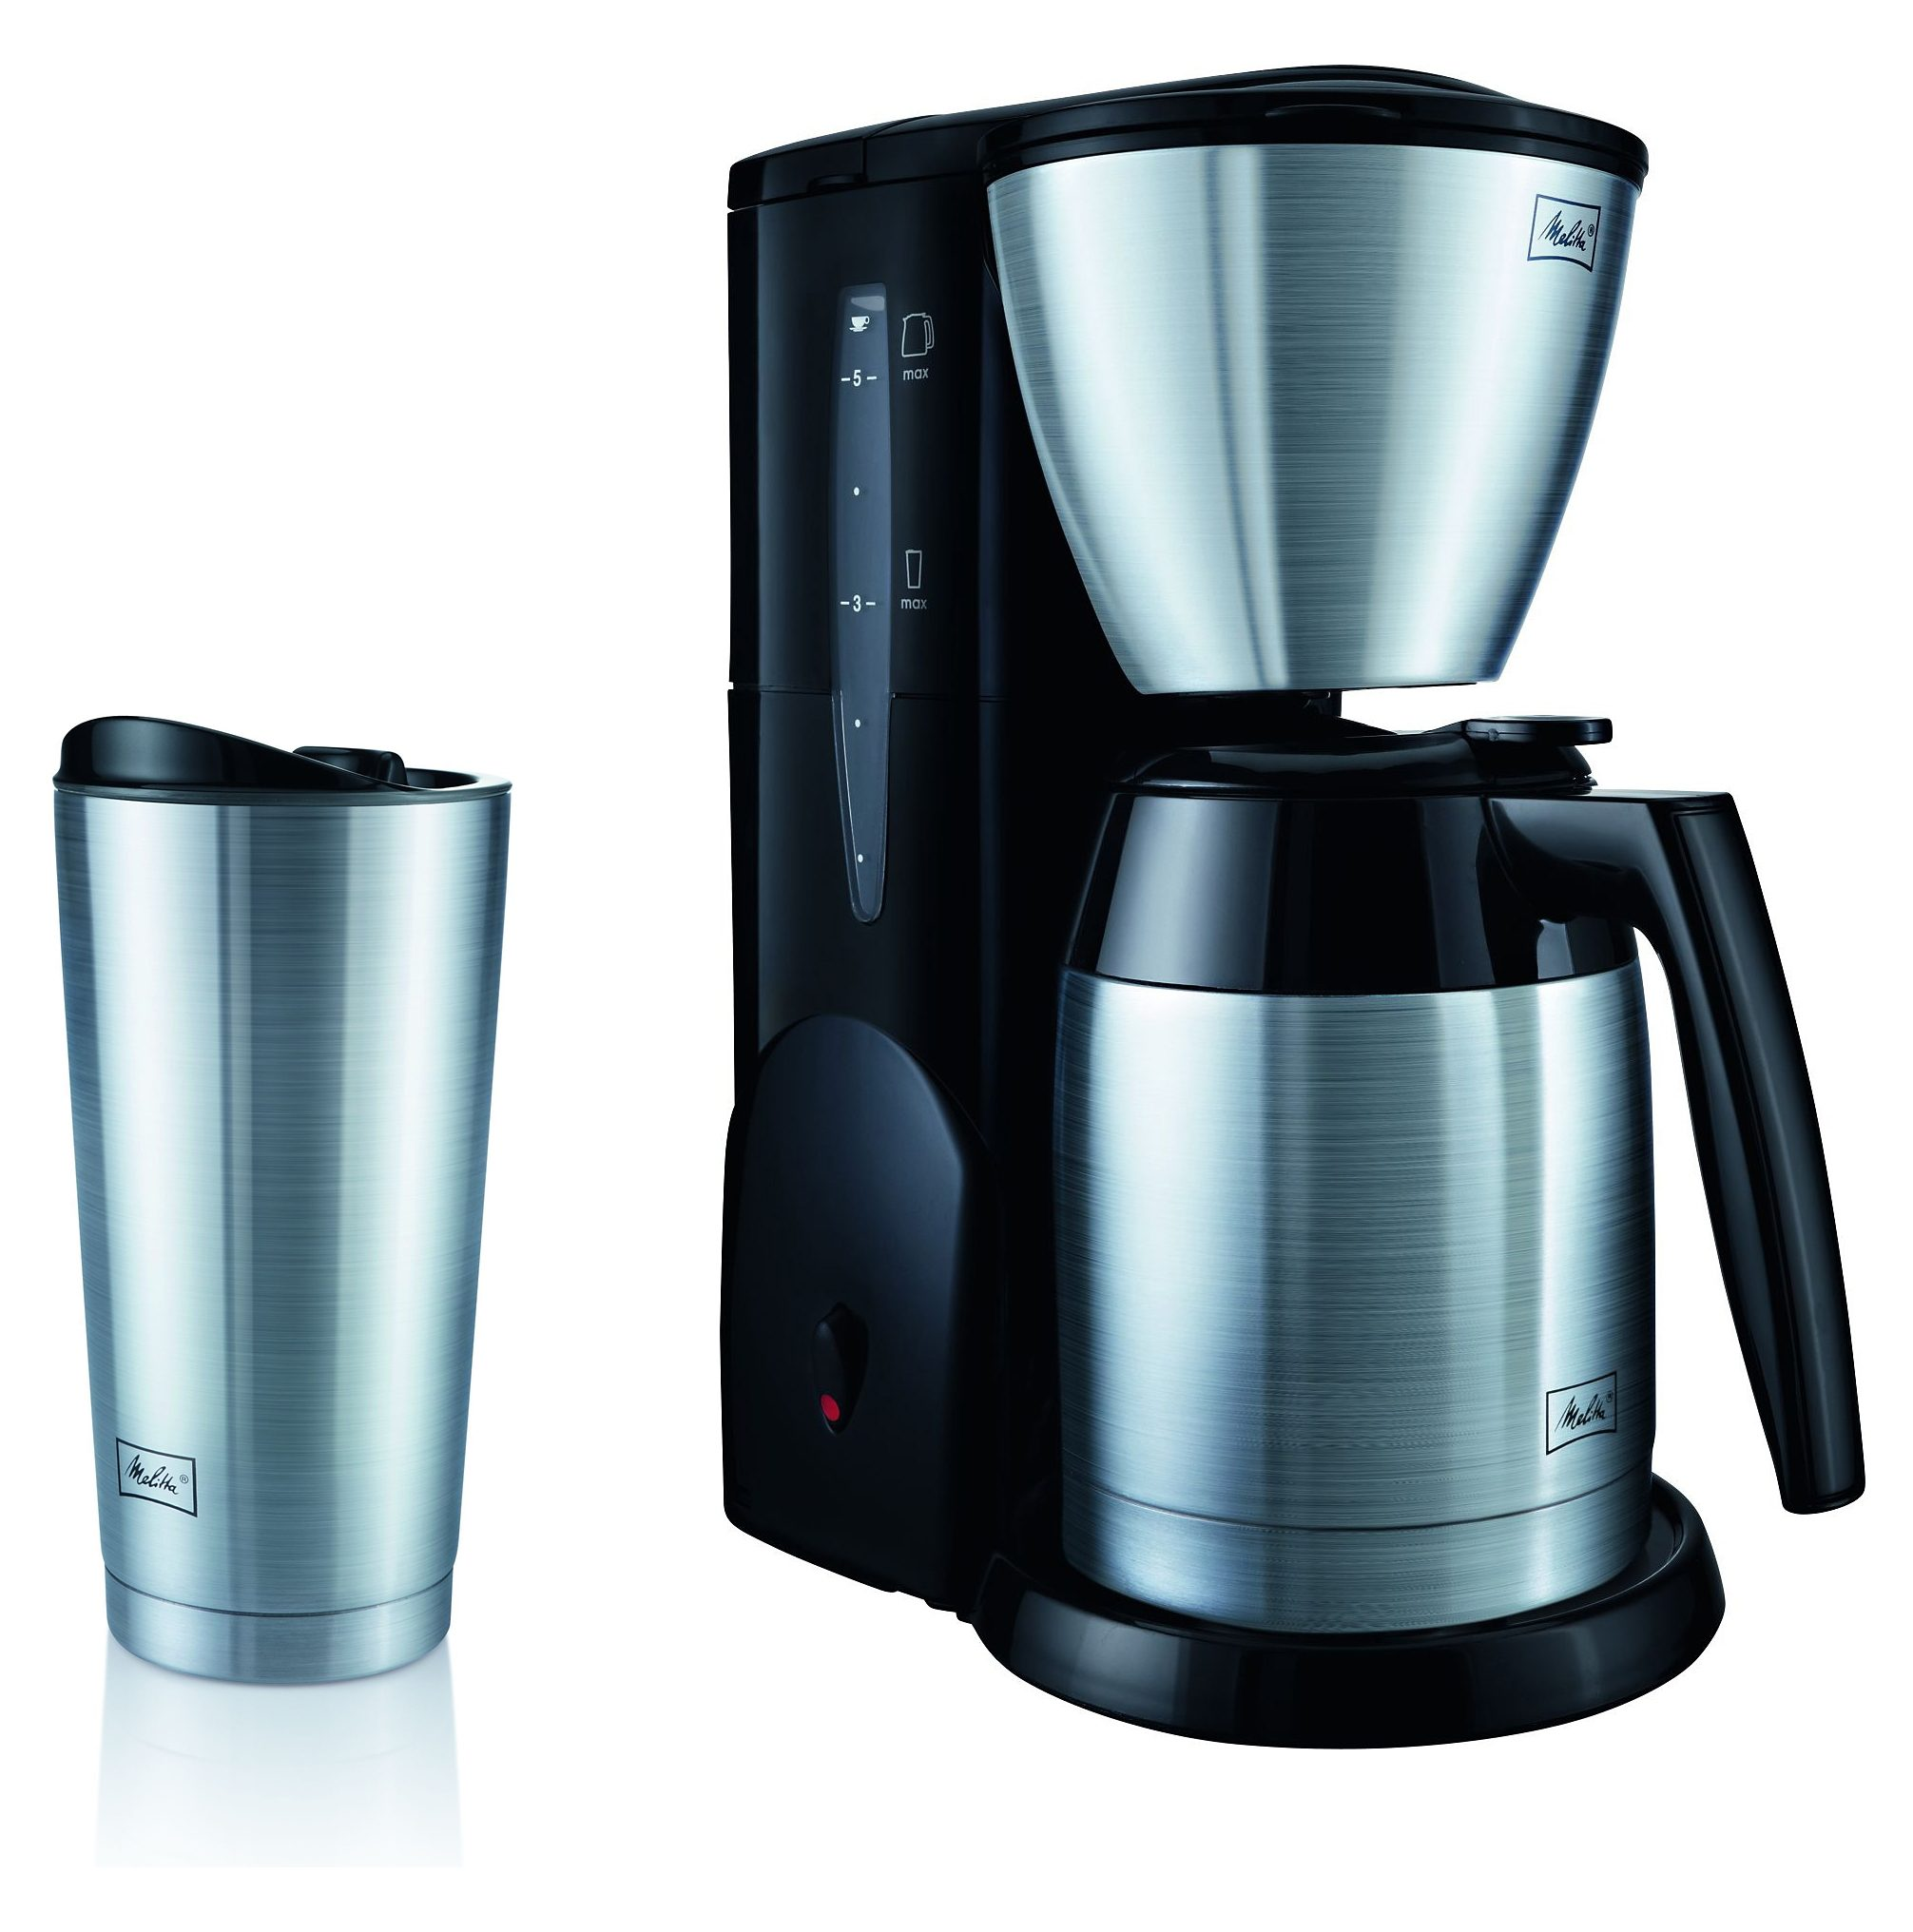 Melitta Filterkaffeemaschine Single5® Therm M728, 0,62l Kaffeekanne, Papierfilter 1x2, mit Edelstahl-Thermobecher